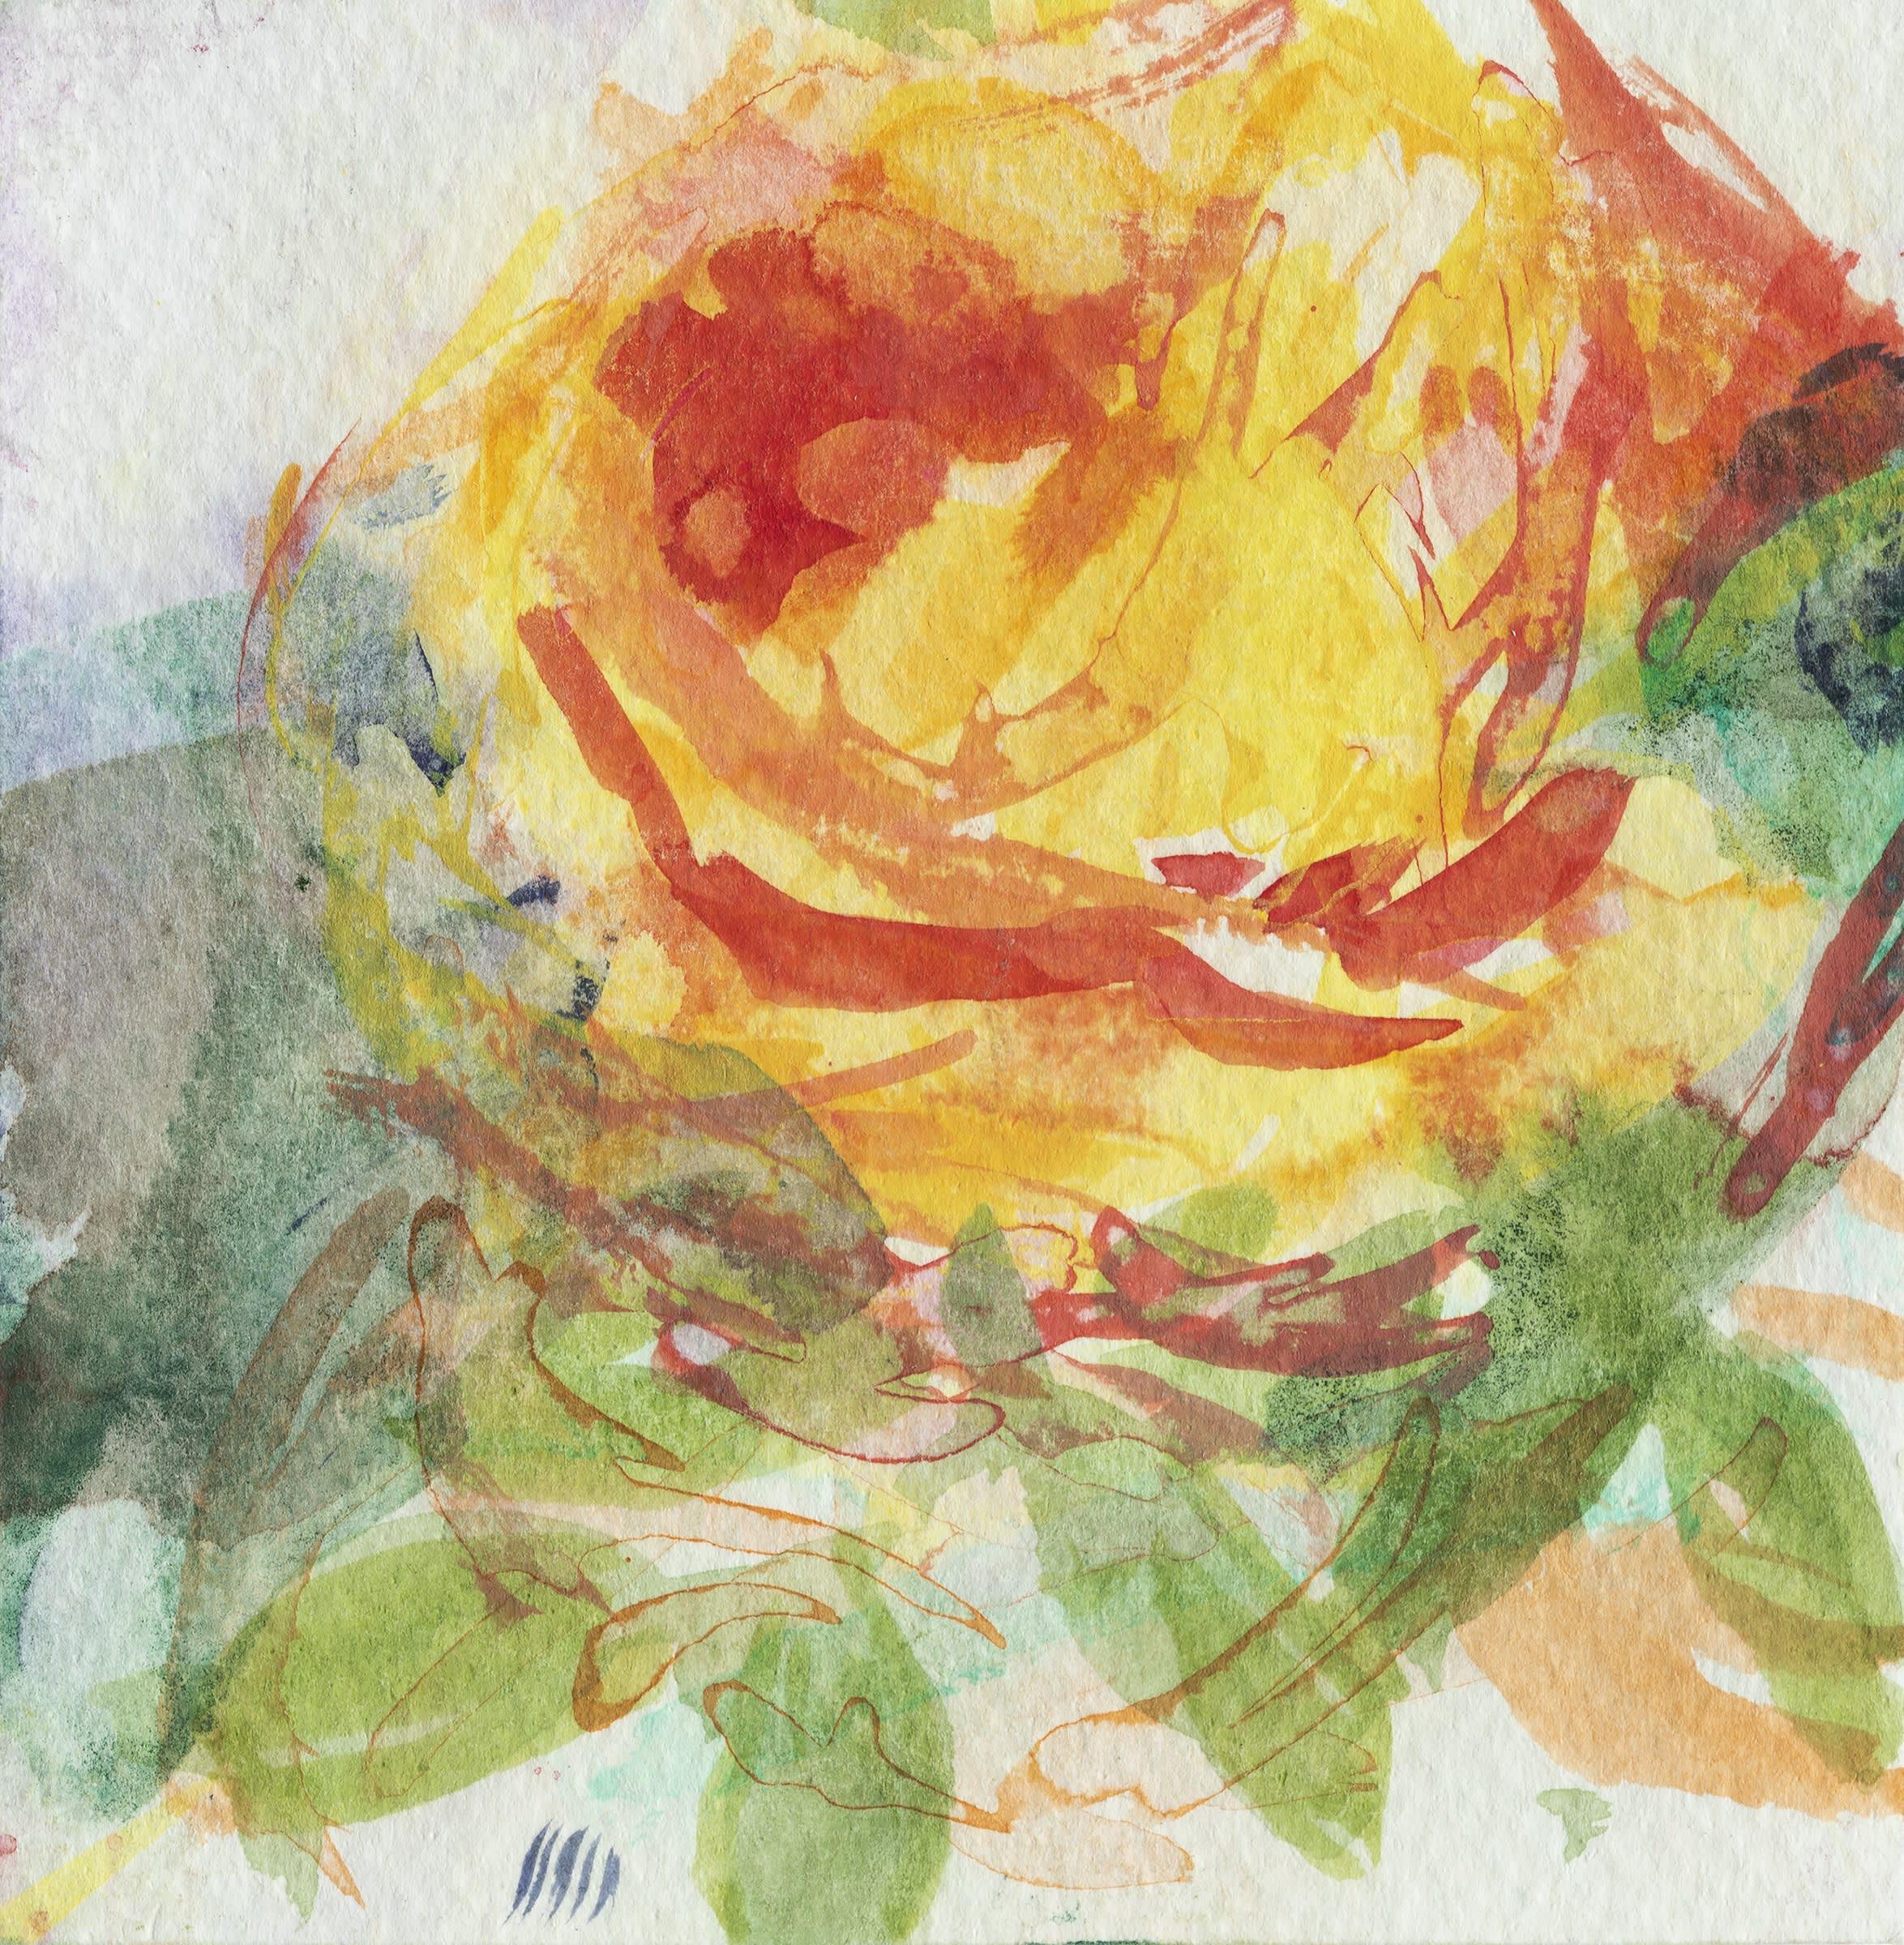 "<span class=""link fancybox-details-link""><a href=""/artists/68-julie-held/works/12638-julie-held-rose/"">View Detail Page</a></span><div class=""artist""><span class=""artist""><strong>Julie Held</strong></span></div><div class=""title""><em>Rose</em></div><div class=""medium"">watercolour on paper</div><div class=""dimensions"">Artwork: 11 x 11cm</div><div class=""price"">£200.00</div>"